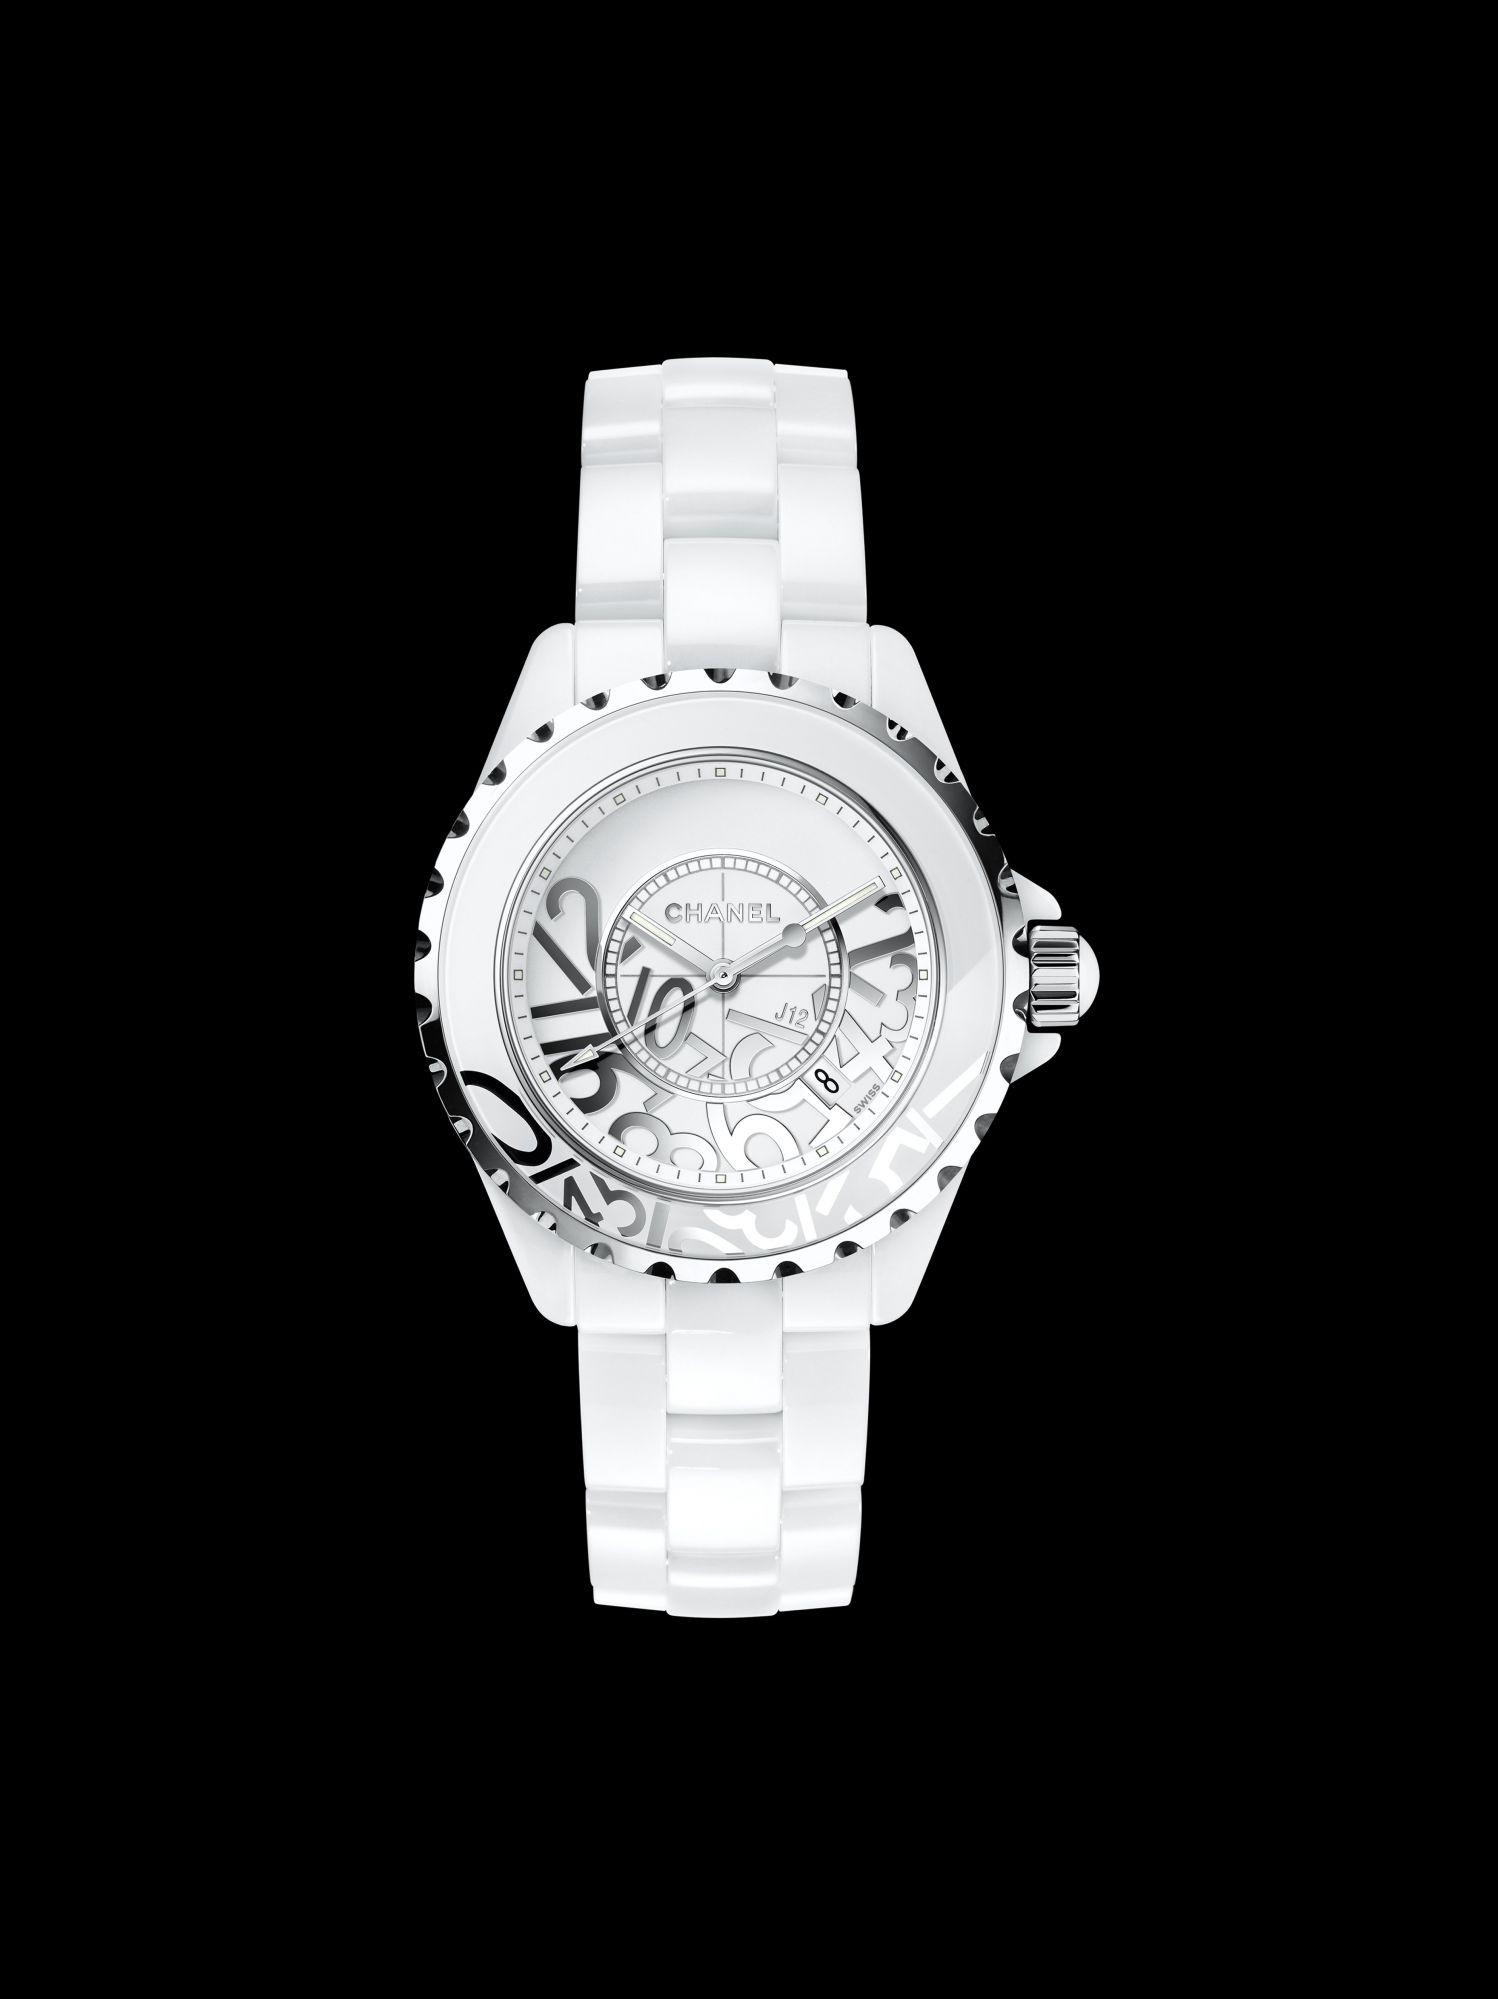 9a5d98e318516 Chanel Celebrates Street Art With New  J12 Graffiti  Watch ...